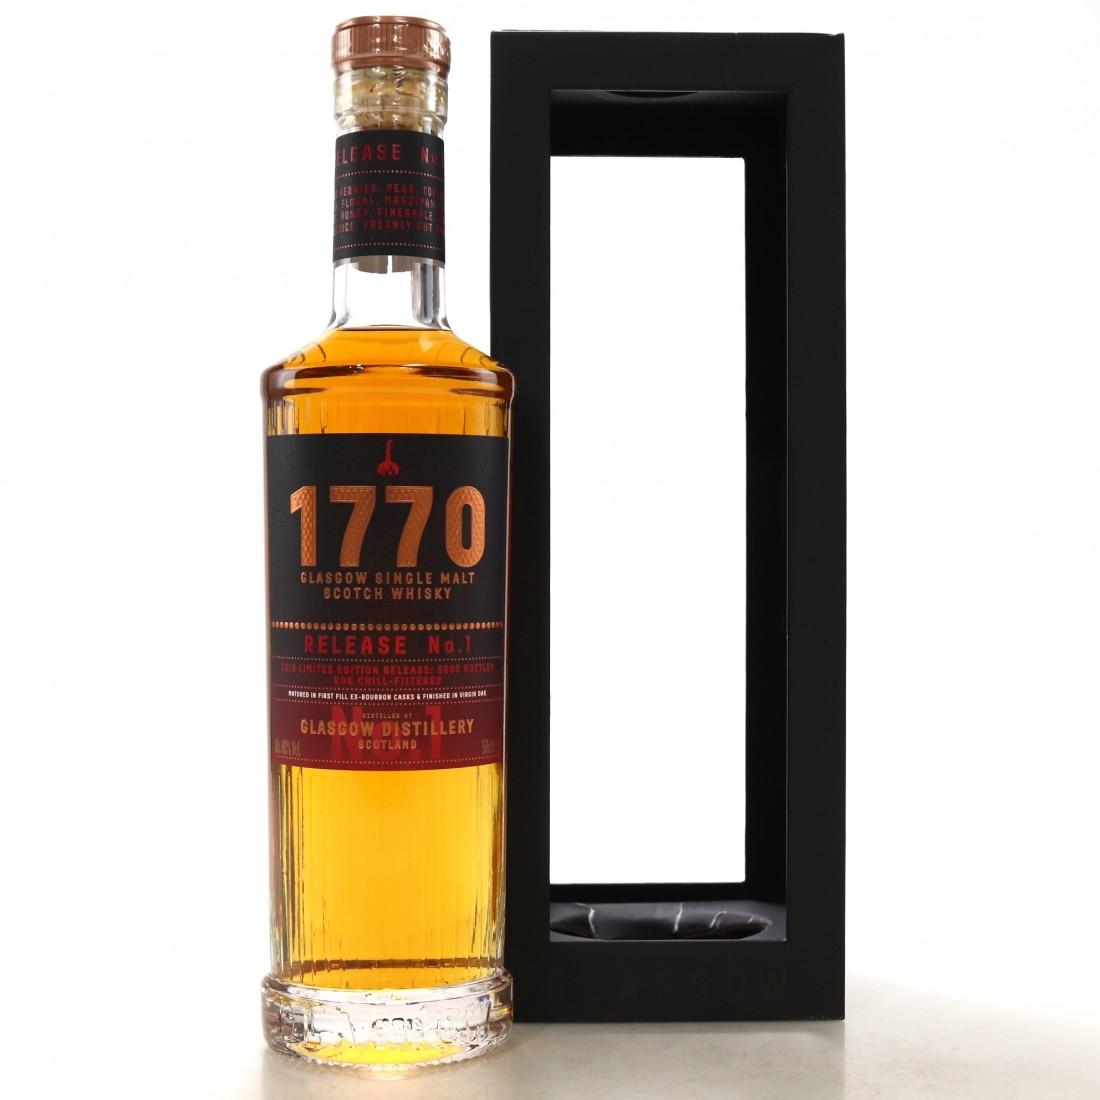 Glasgow '1770' Release No.1 / 50cl